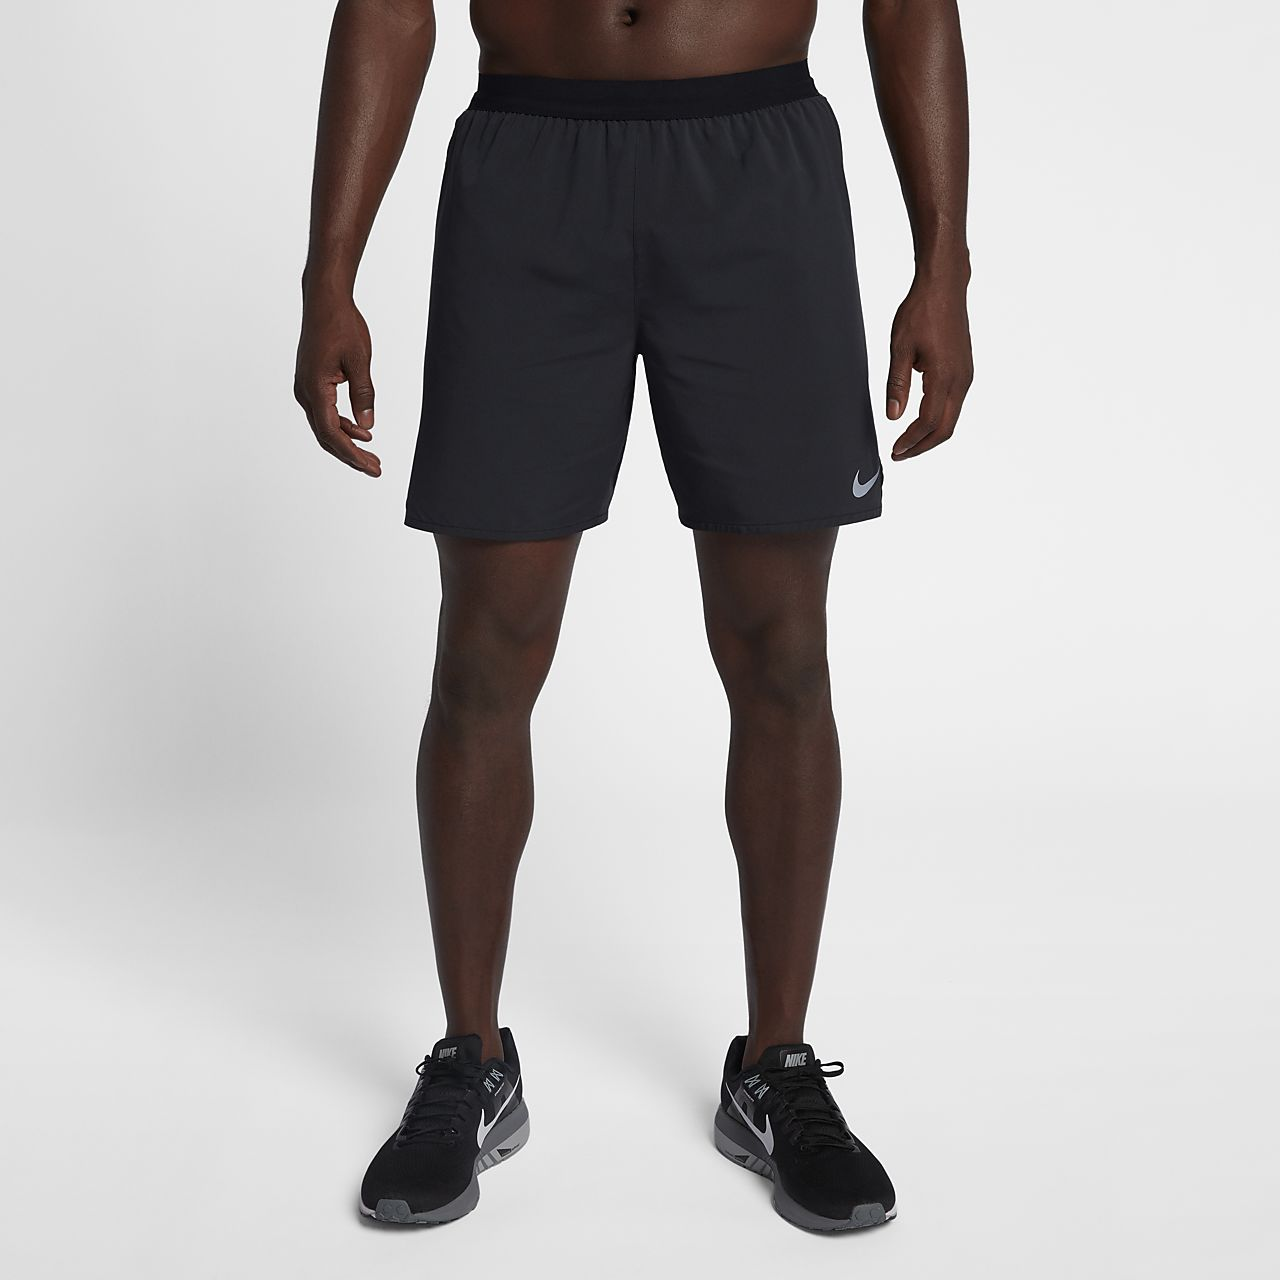 "Nike Distance Men's 7"" Unlined Running Shorts"